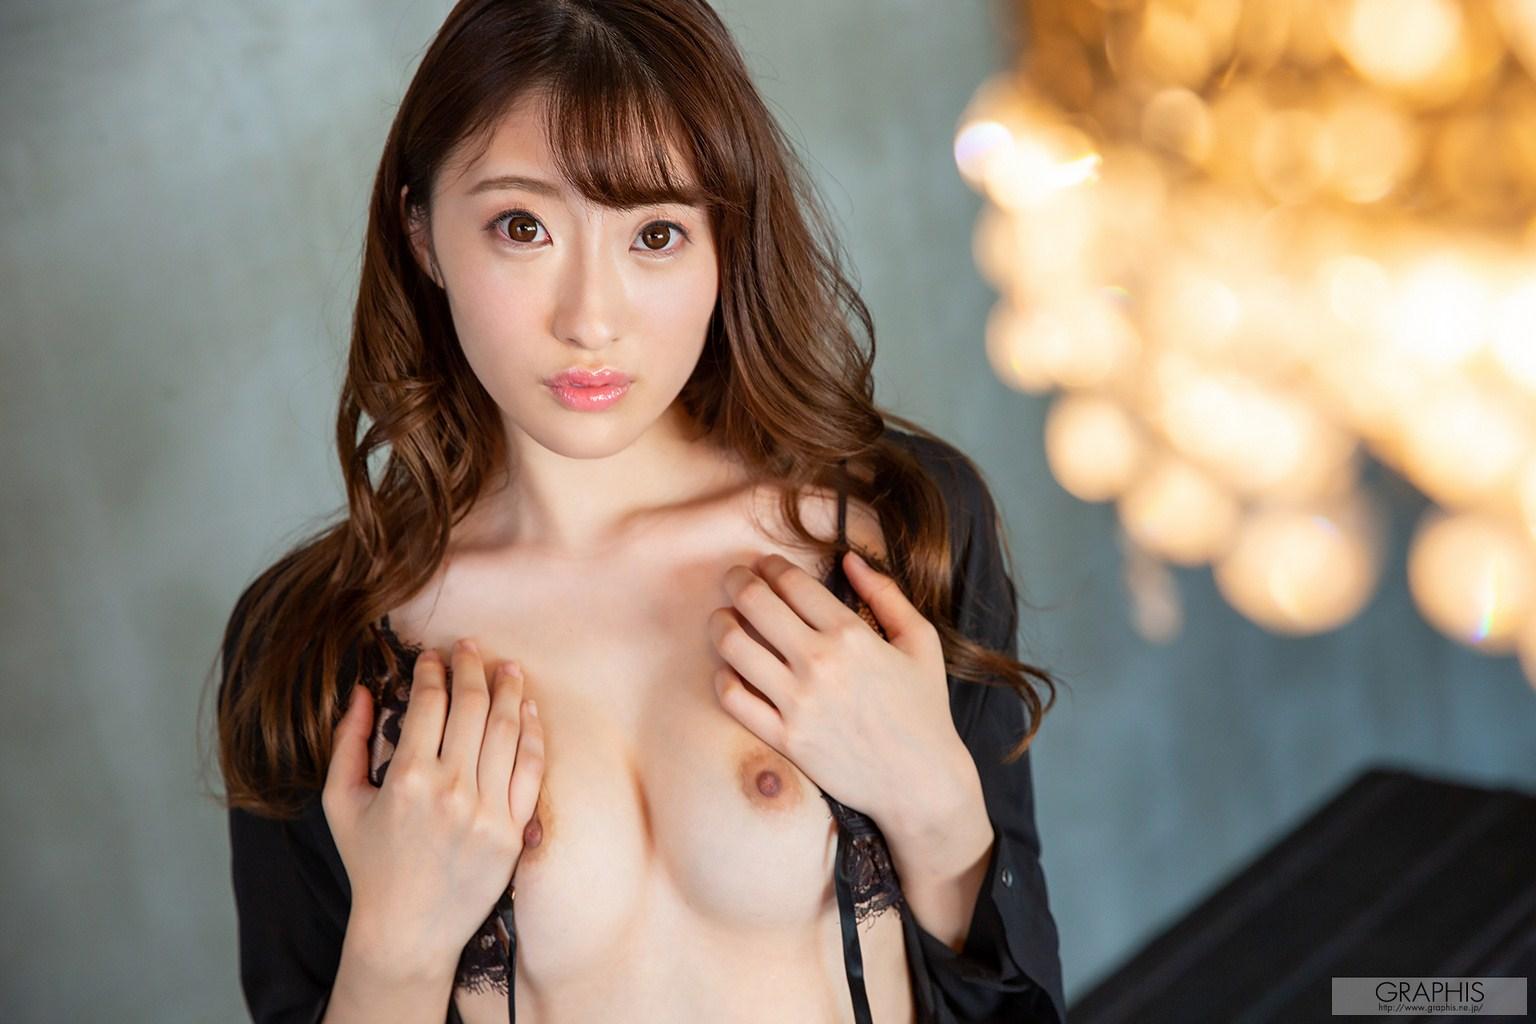 Ichika Hoshimiya 星宮一花, [Graphis] (初脫ぎ娘) Set.02 [34P] - 貼圖 - 清涼寫真 -